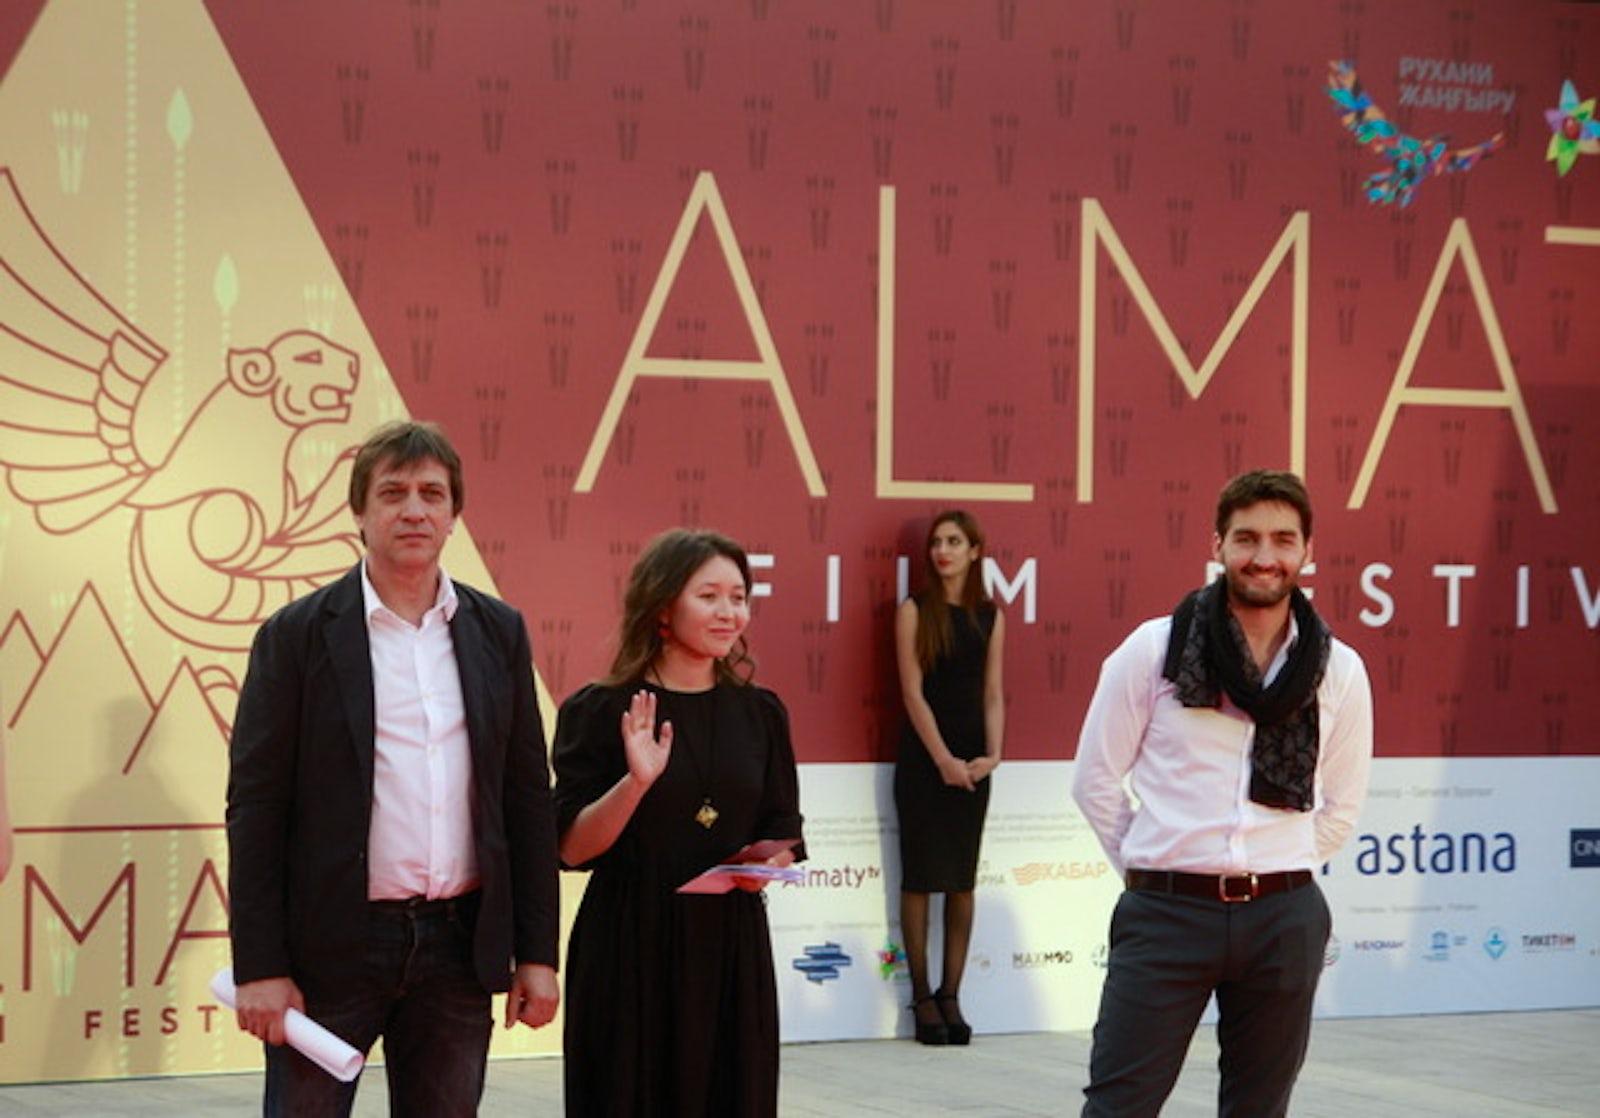 Cover photo ©Credits to Almaty Film Festival